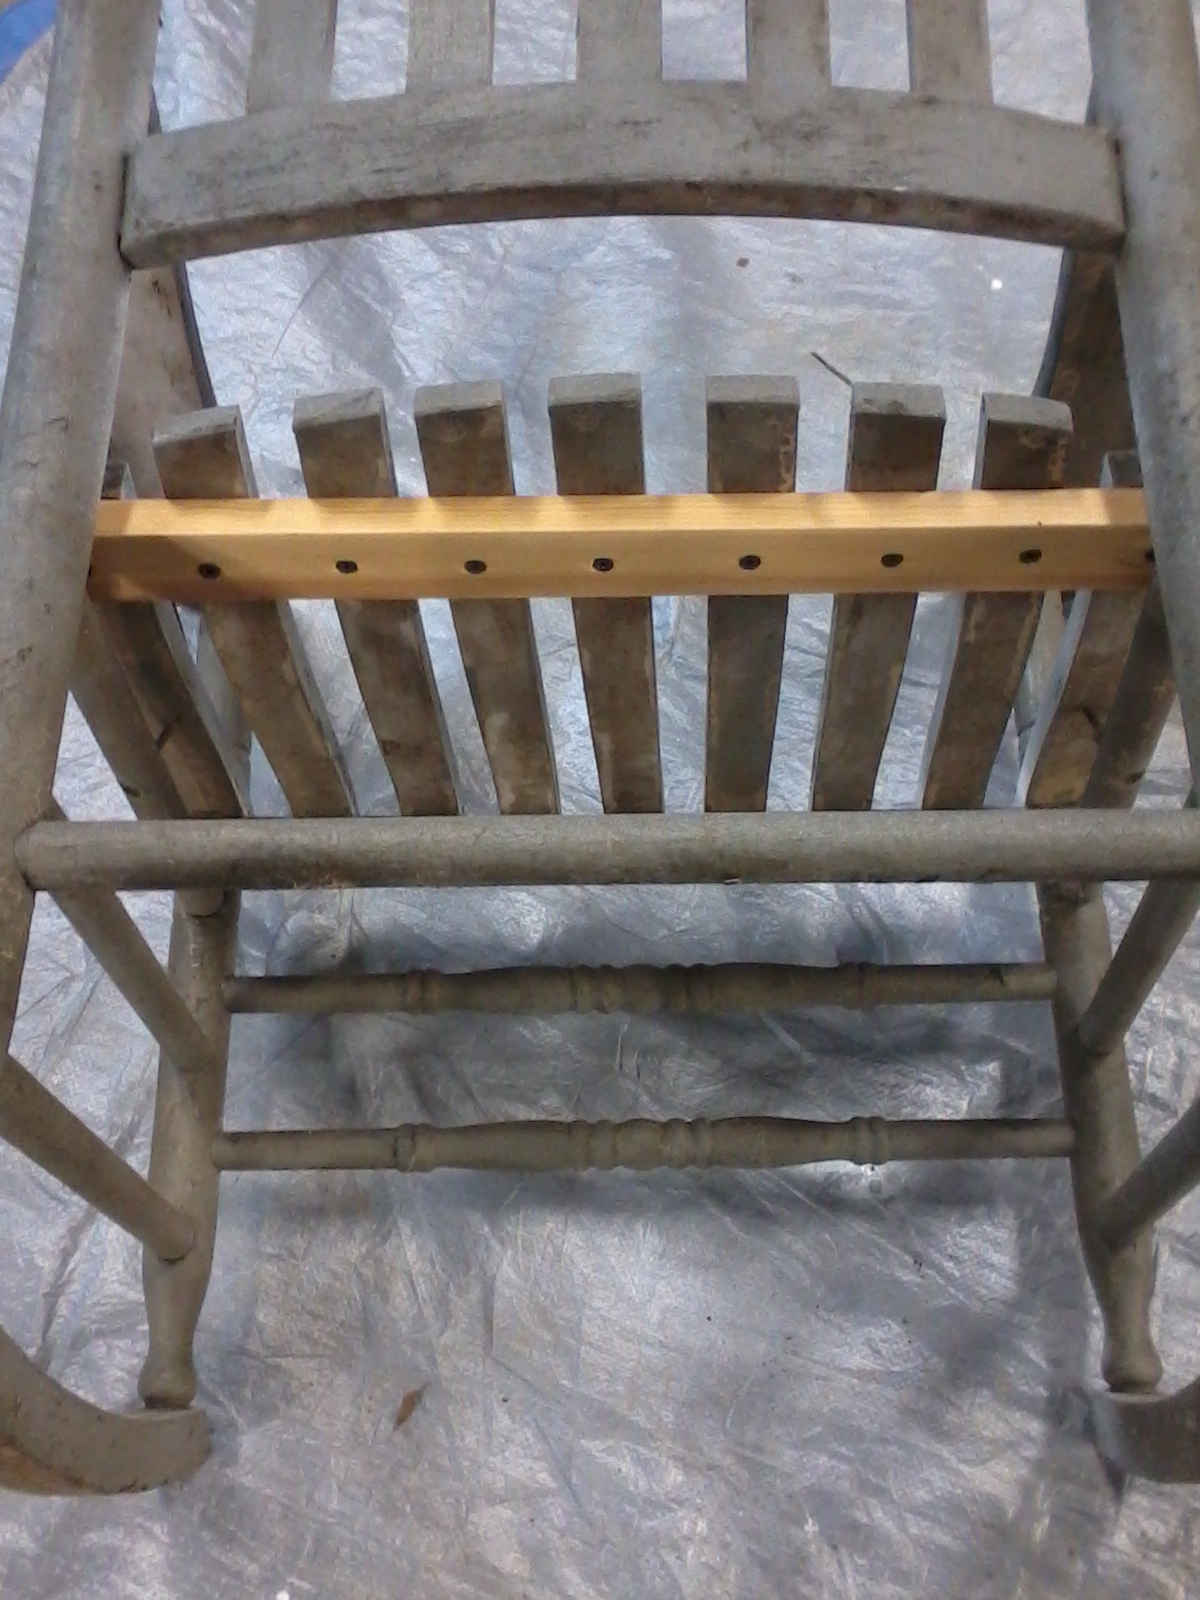 aunt priscilla has a rocking chair big joe dorm bean bag antique make over  funcycled